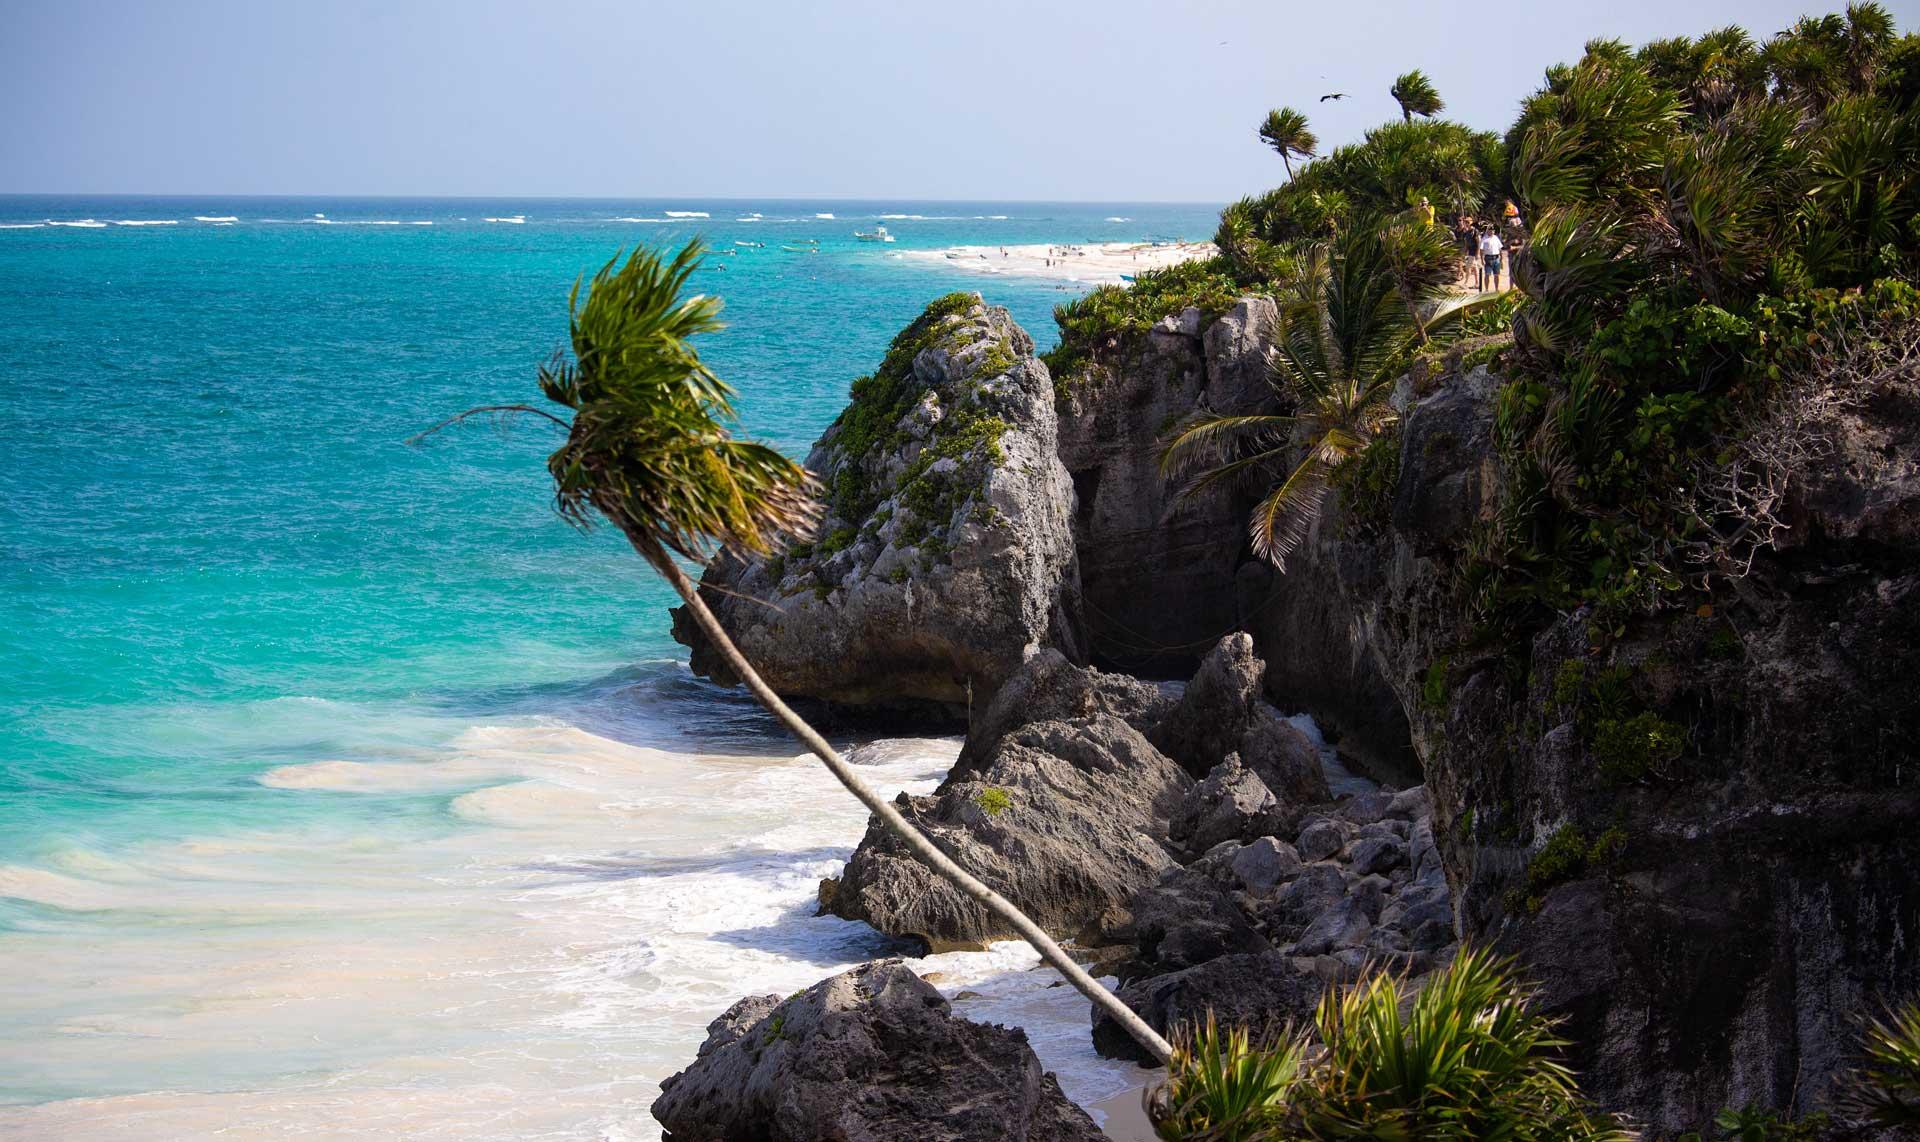 http://www.mundomex.com.mx/sites/default/files/images/playas-mexicanas-1_0.jpg